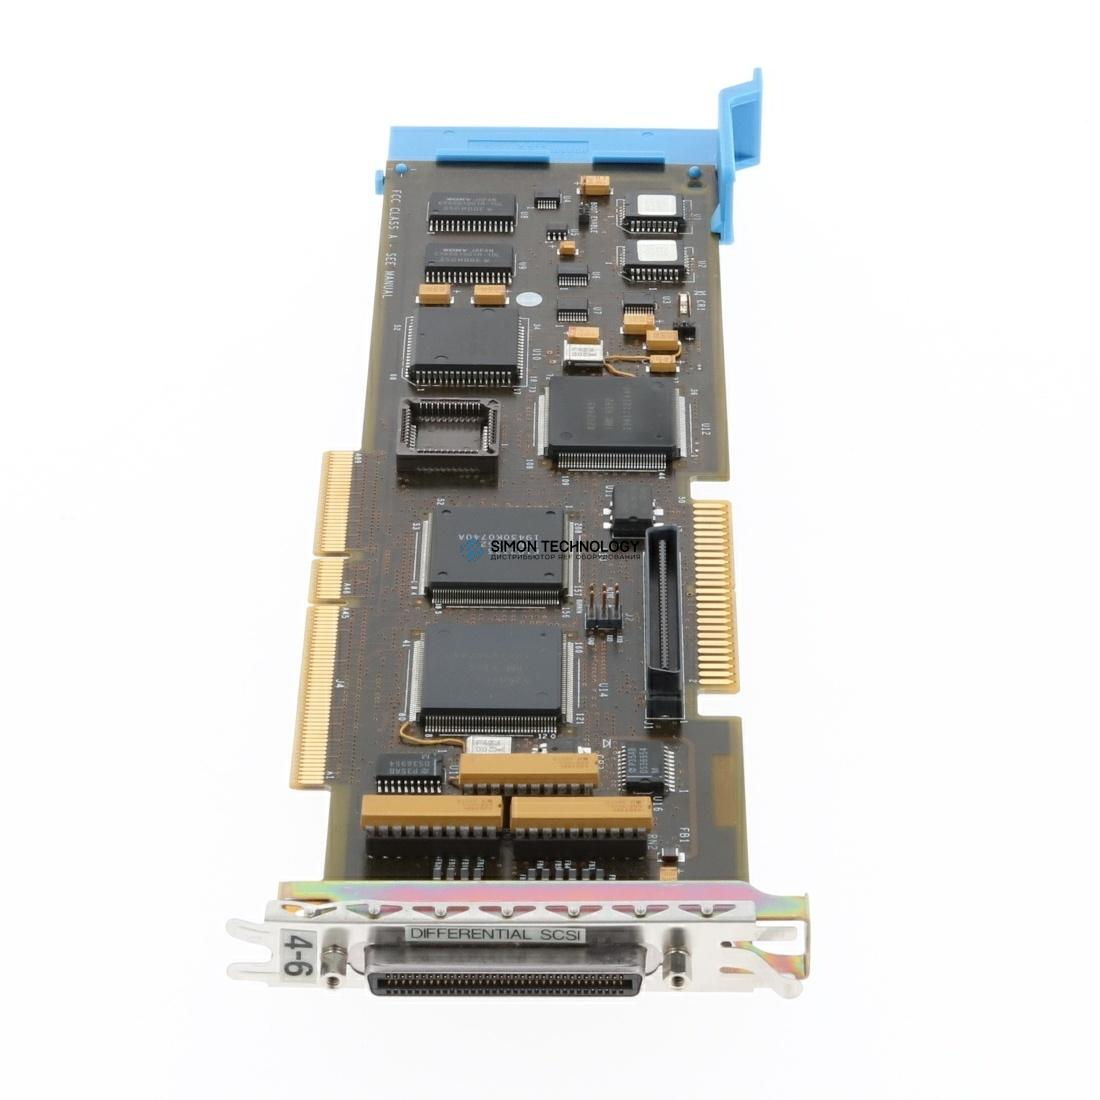 Контроллер IBM SCSI2 Differential F/W Adapter (06H4675)